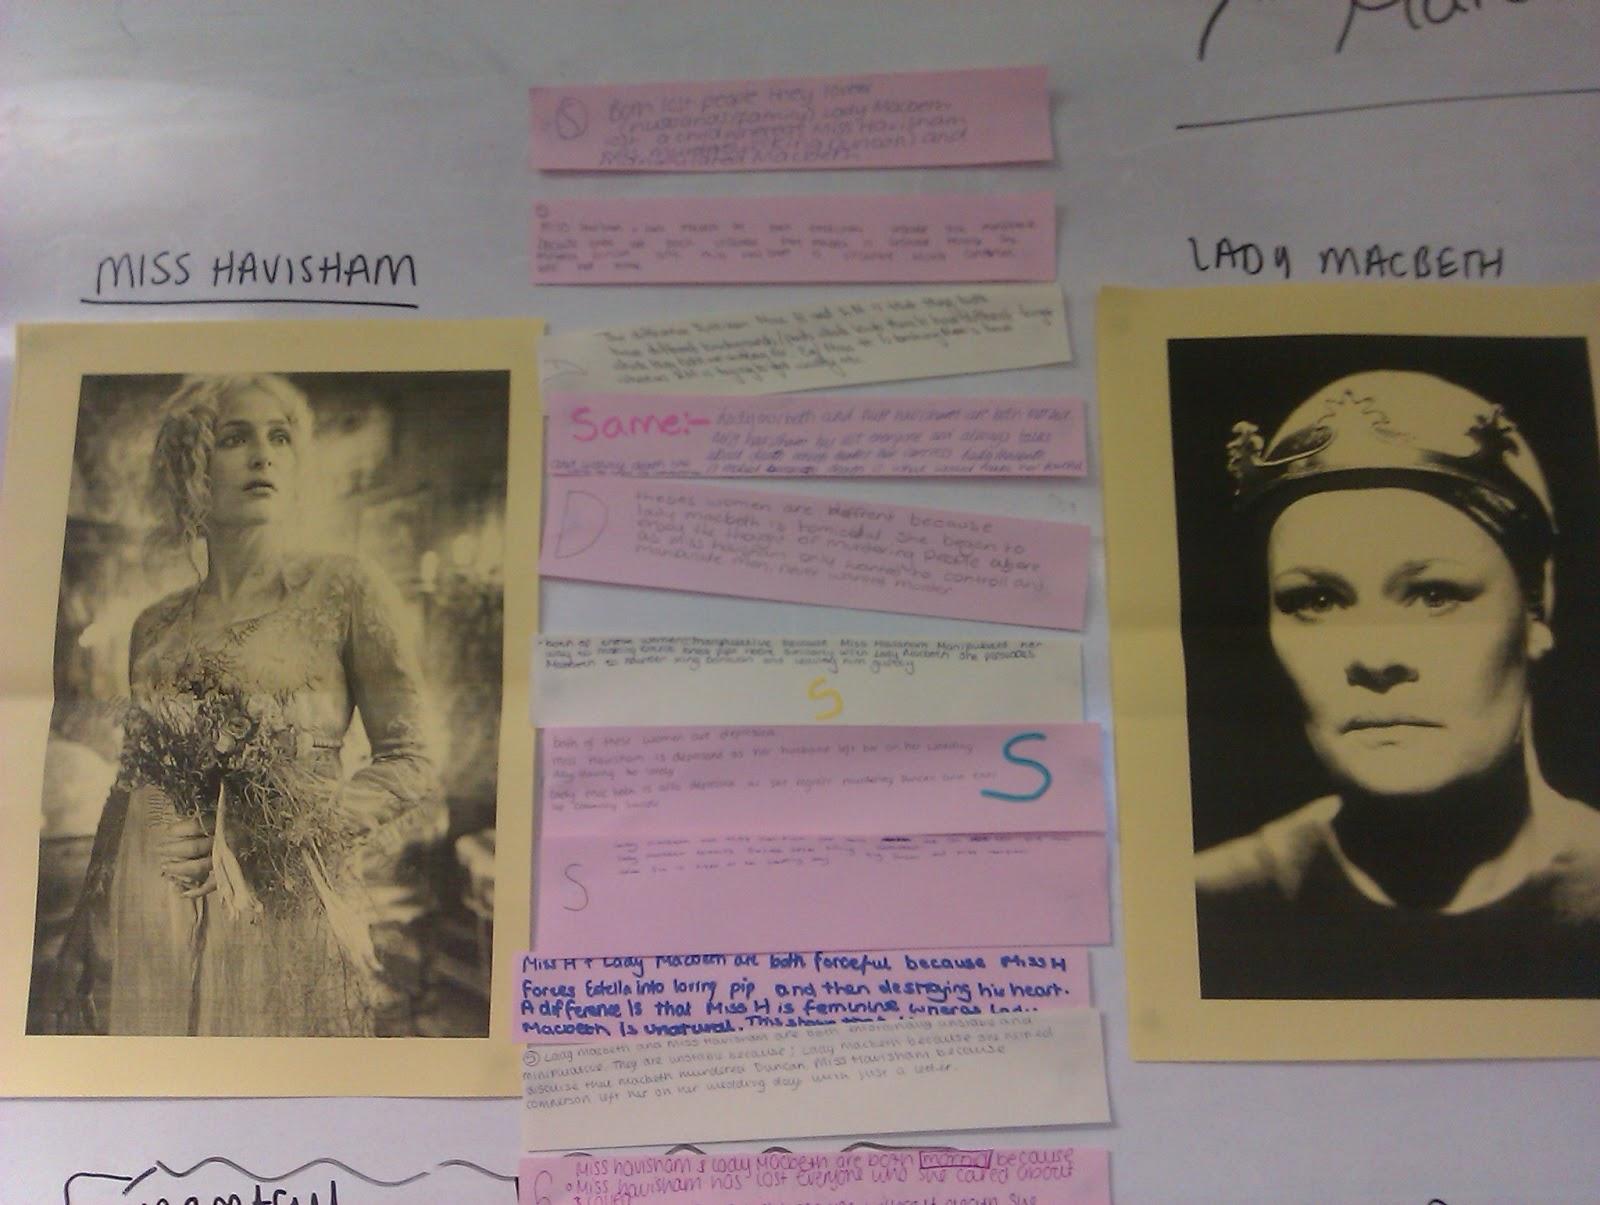 lady macbeth and miss havisham disturbed essay